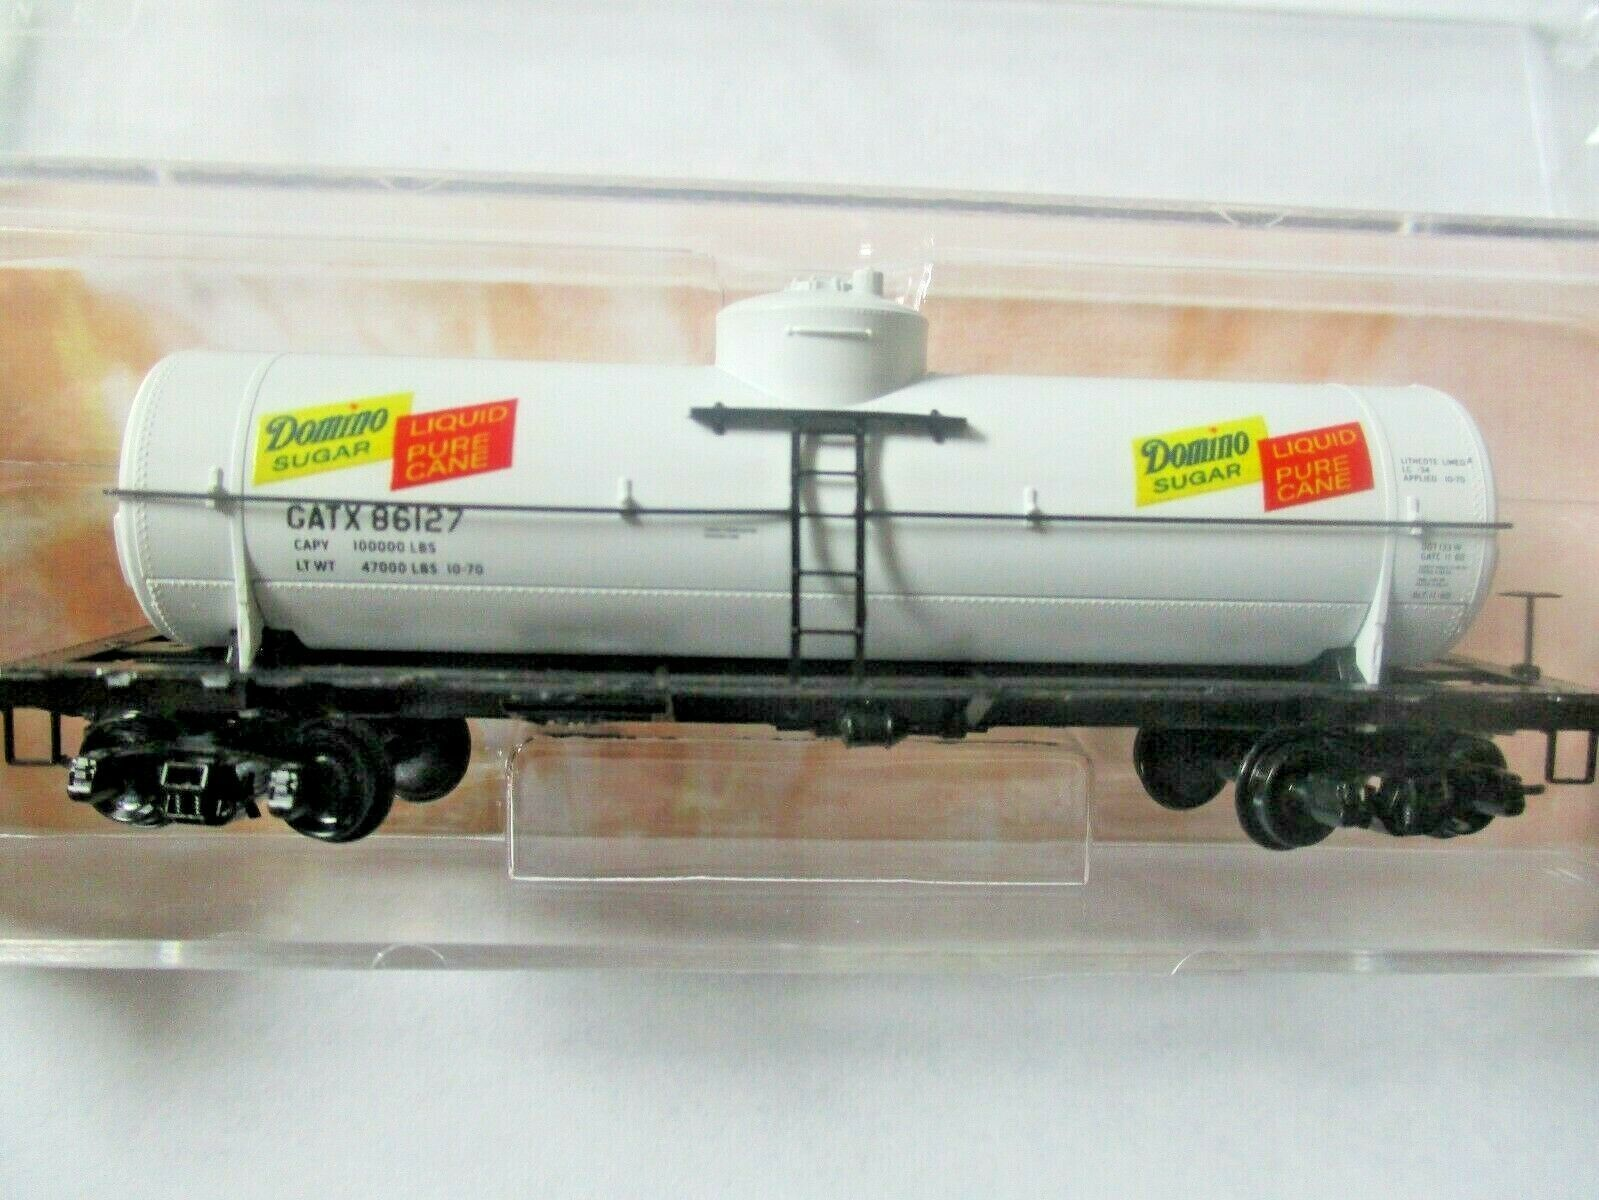 Micro-Trains # 06500176 Domino Sugar 39' Single Dome Tank Car Car # 5 N-Scale